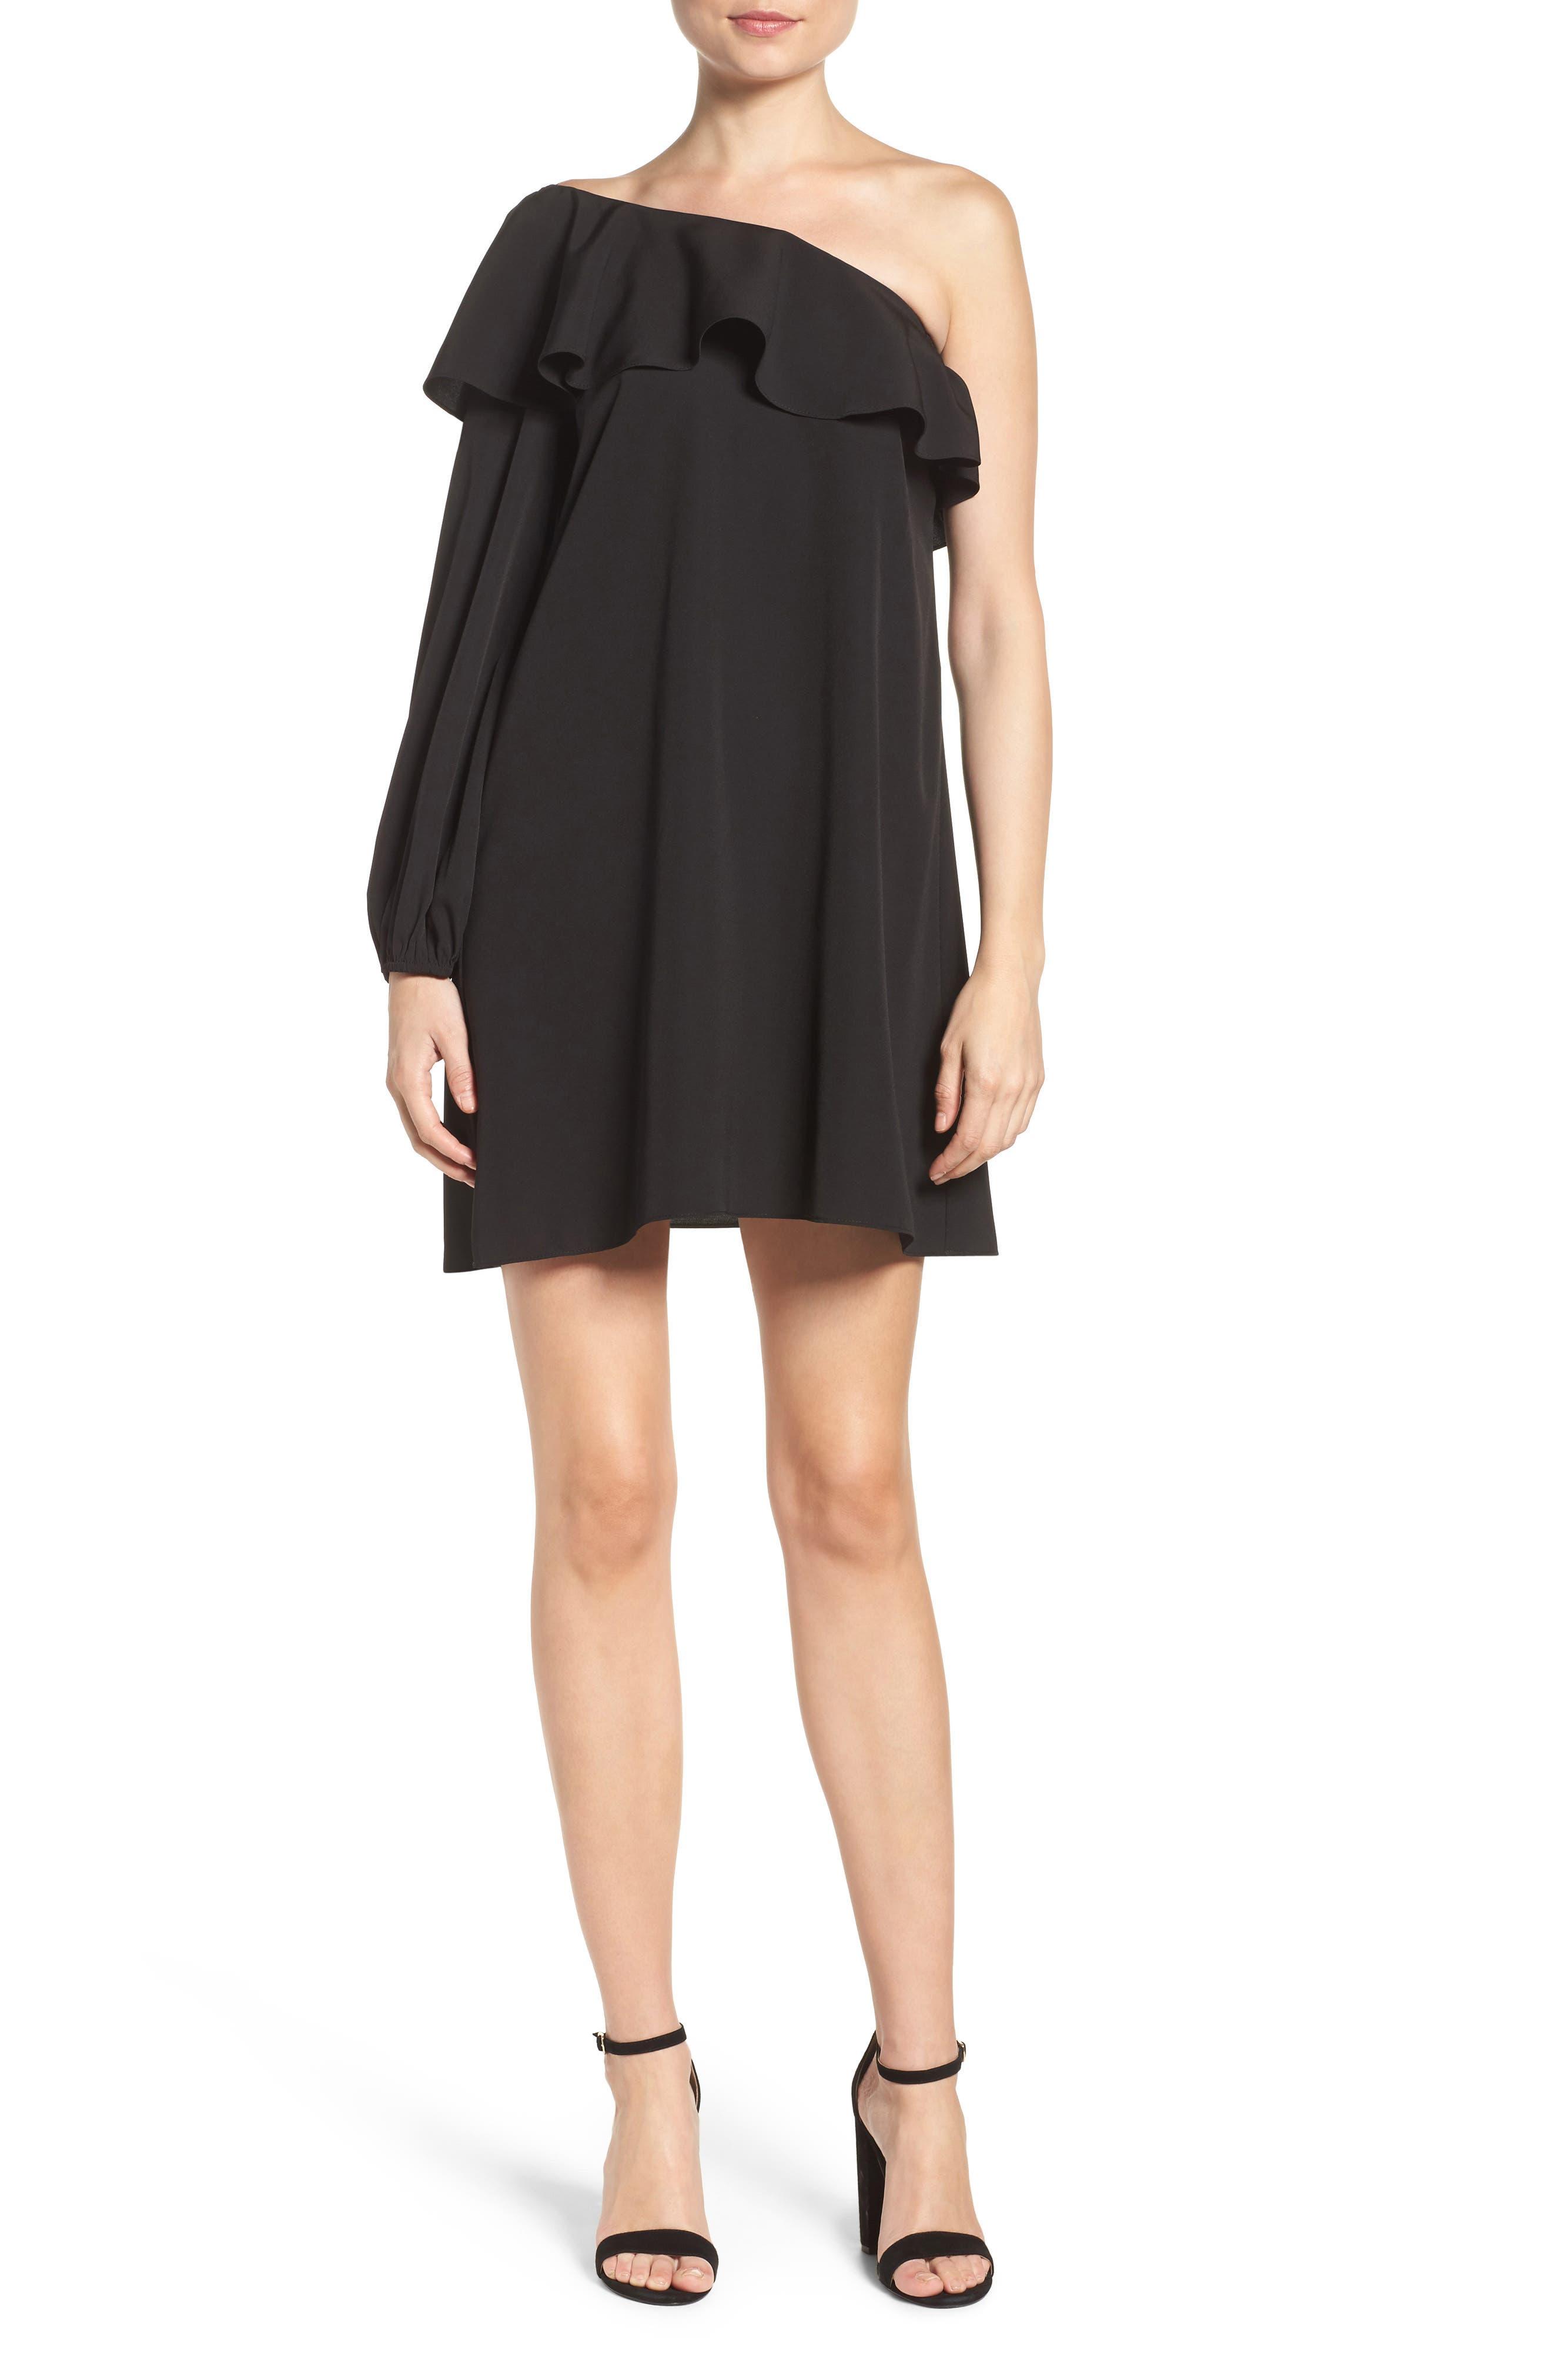 A BY AMANDA Luella One-Shoulder Dress, Main, color, 001